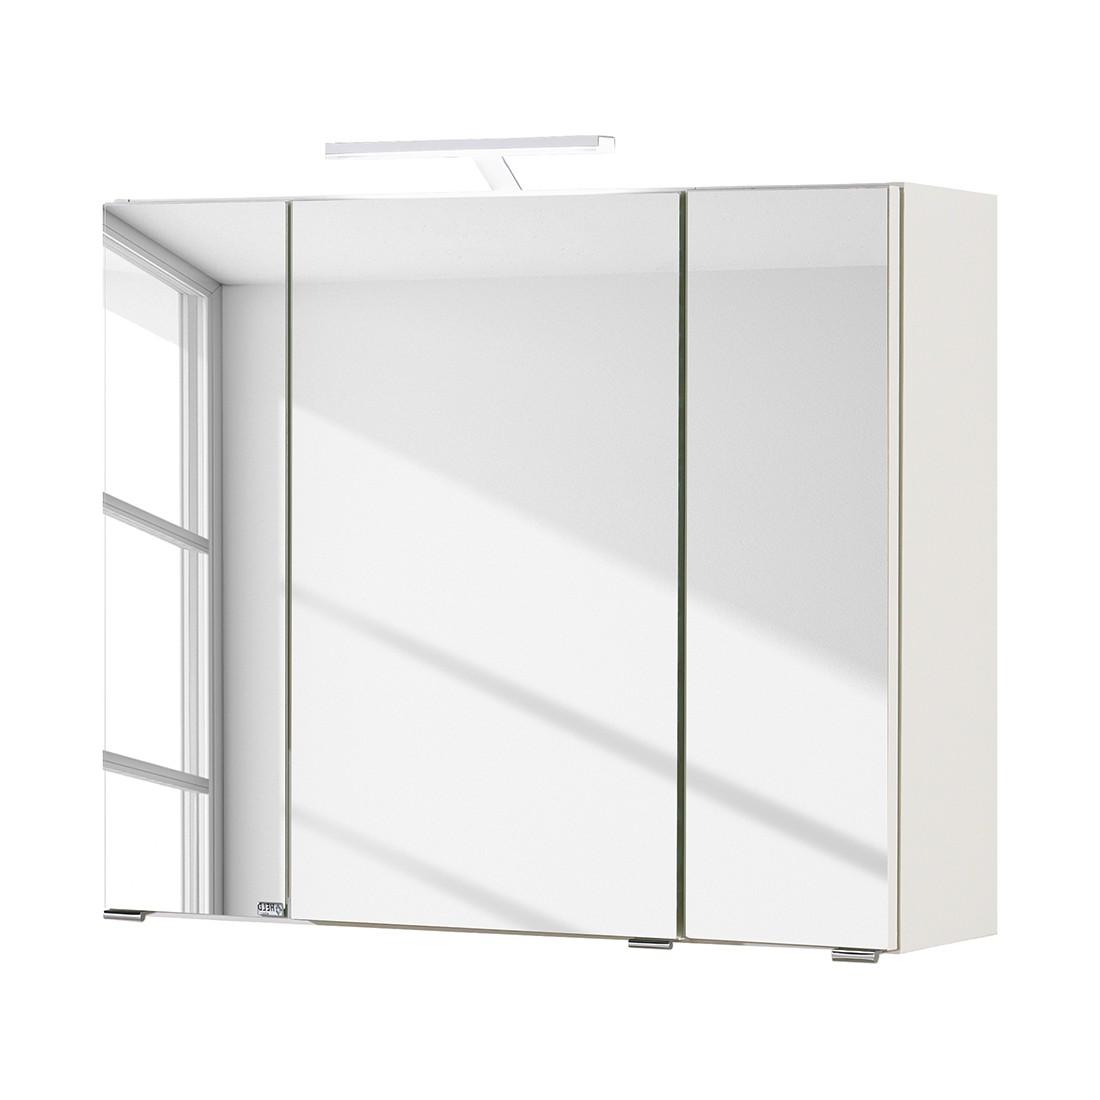 Armoire avec miroir Turda II - Avec éclairage Blanc, mooved